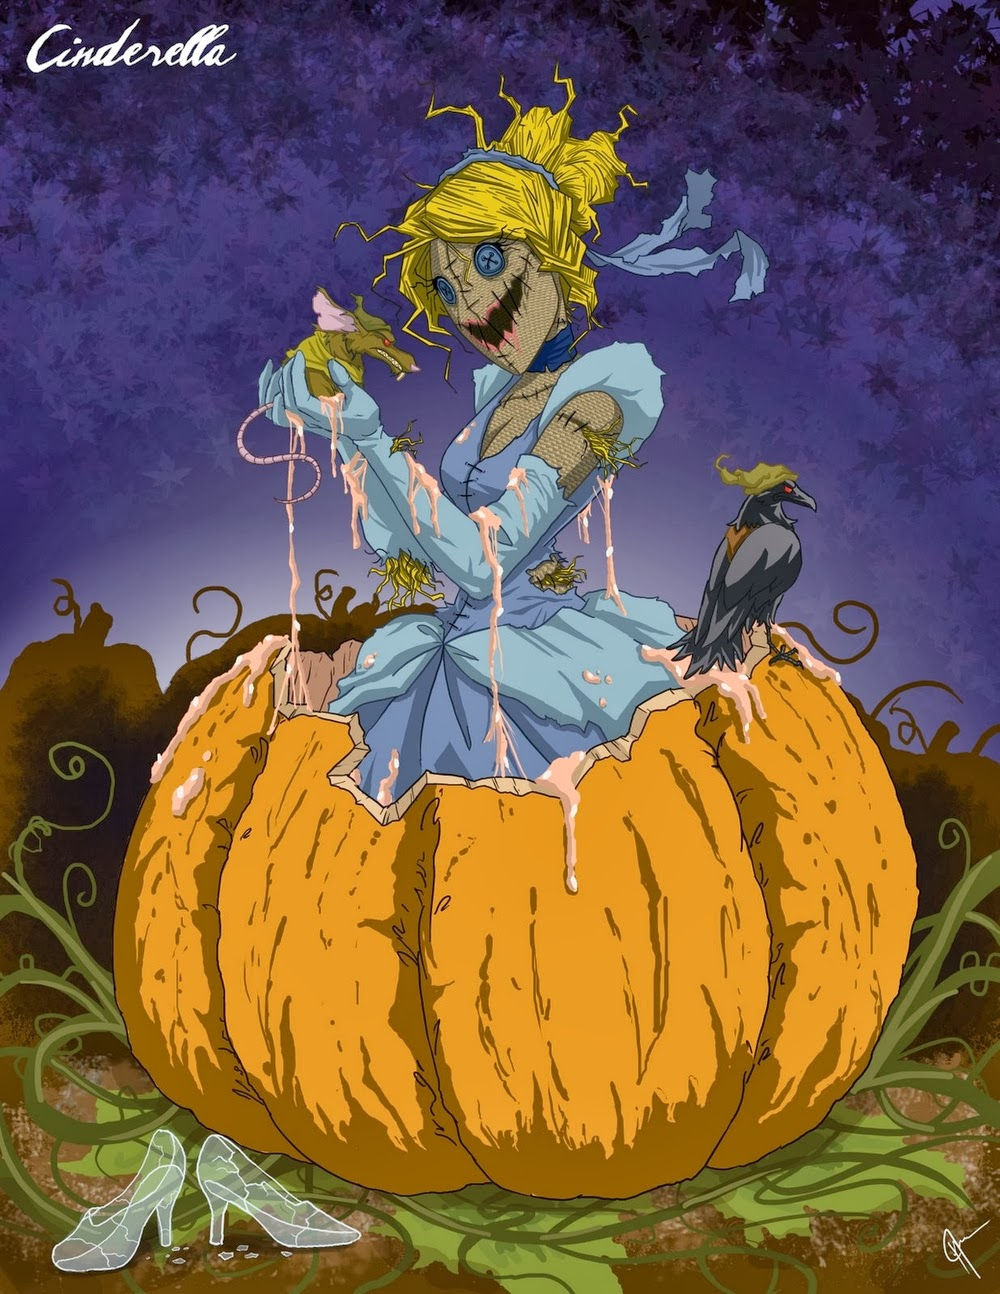 06-Cinderella-Jeffrey-Thomas-Twisted-Princess-www-designstack-co